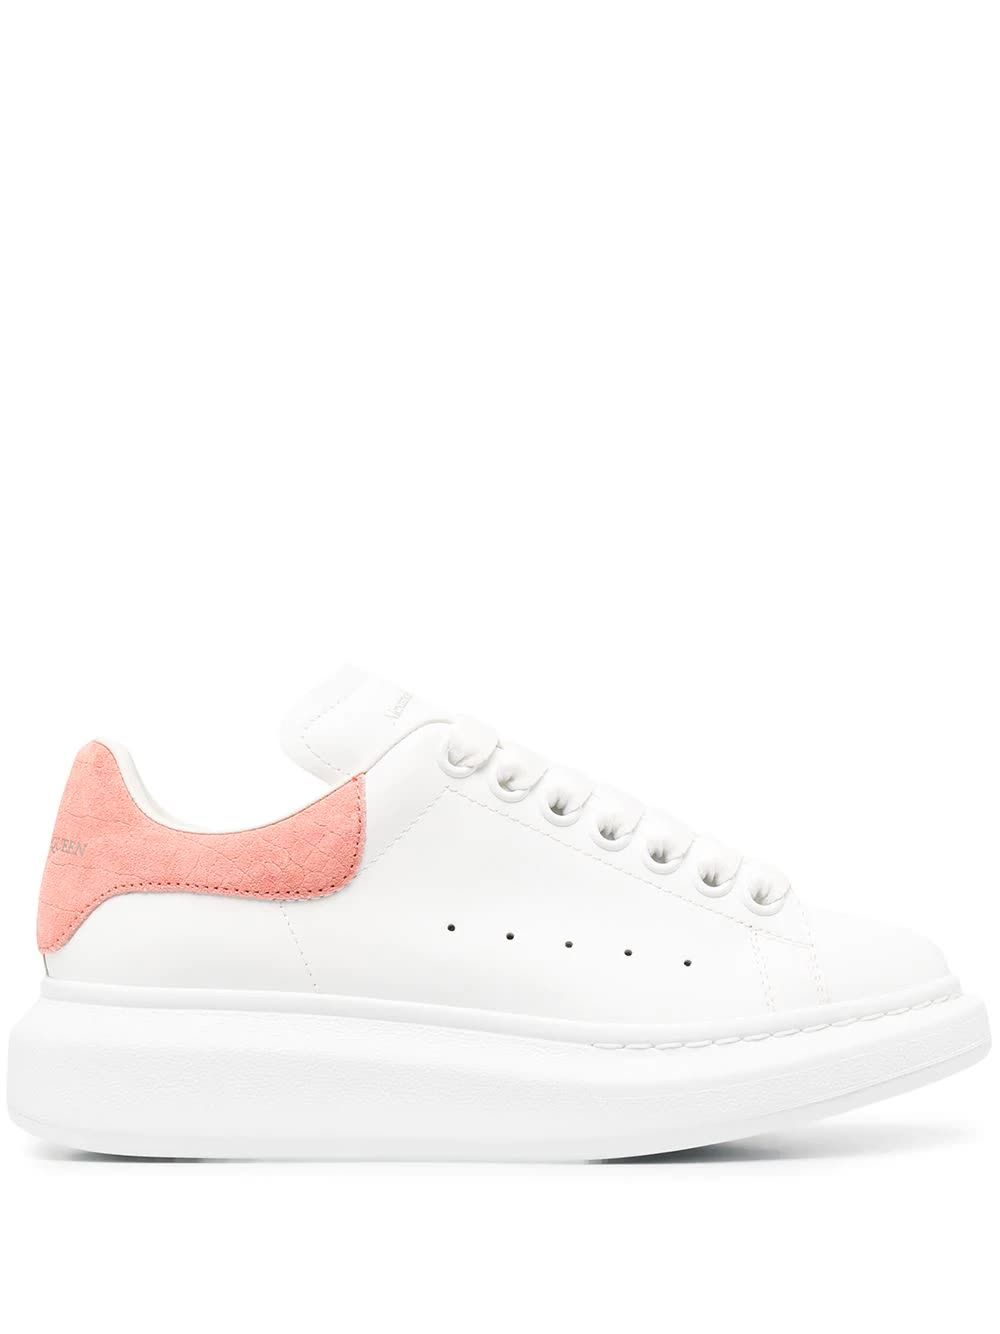 Buy Alexander McQueen Woman White Oversize Sneakers With Pink Crocodile Effect Spoiler online, shop Alexander McQueen shoes with free shipping